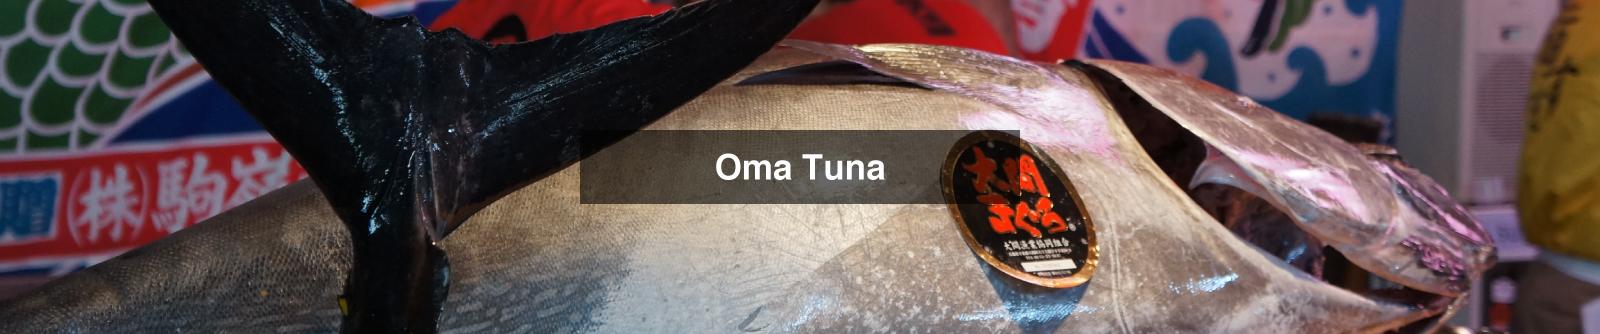 Oma Tuna